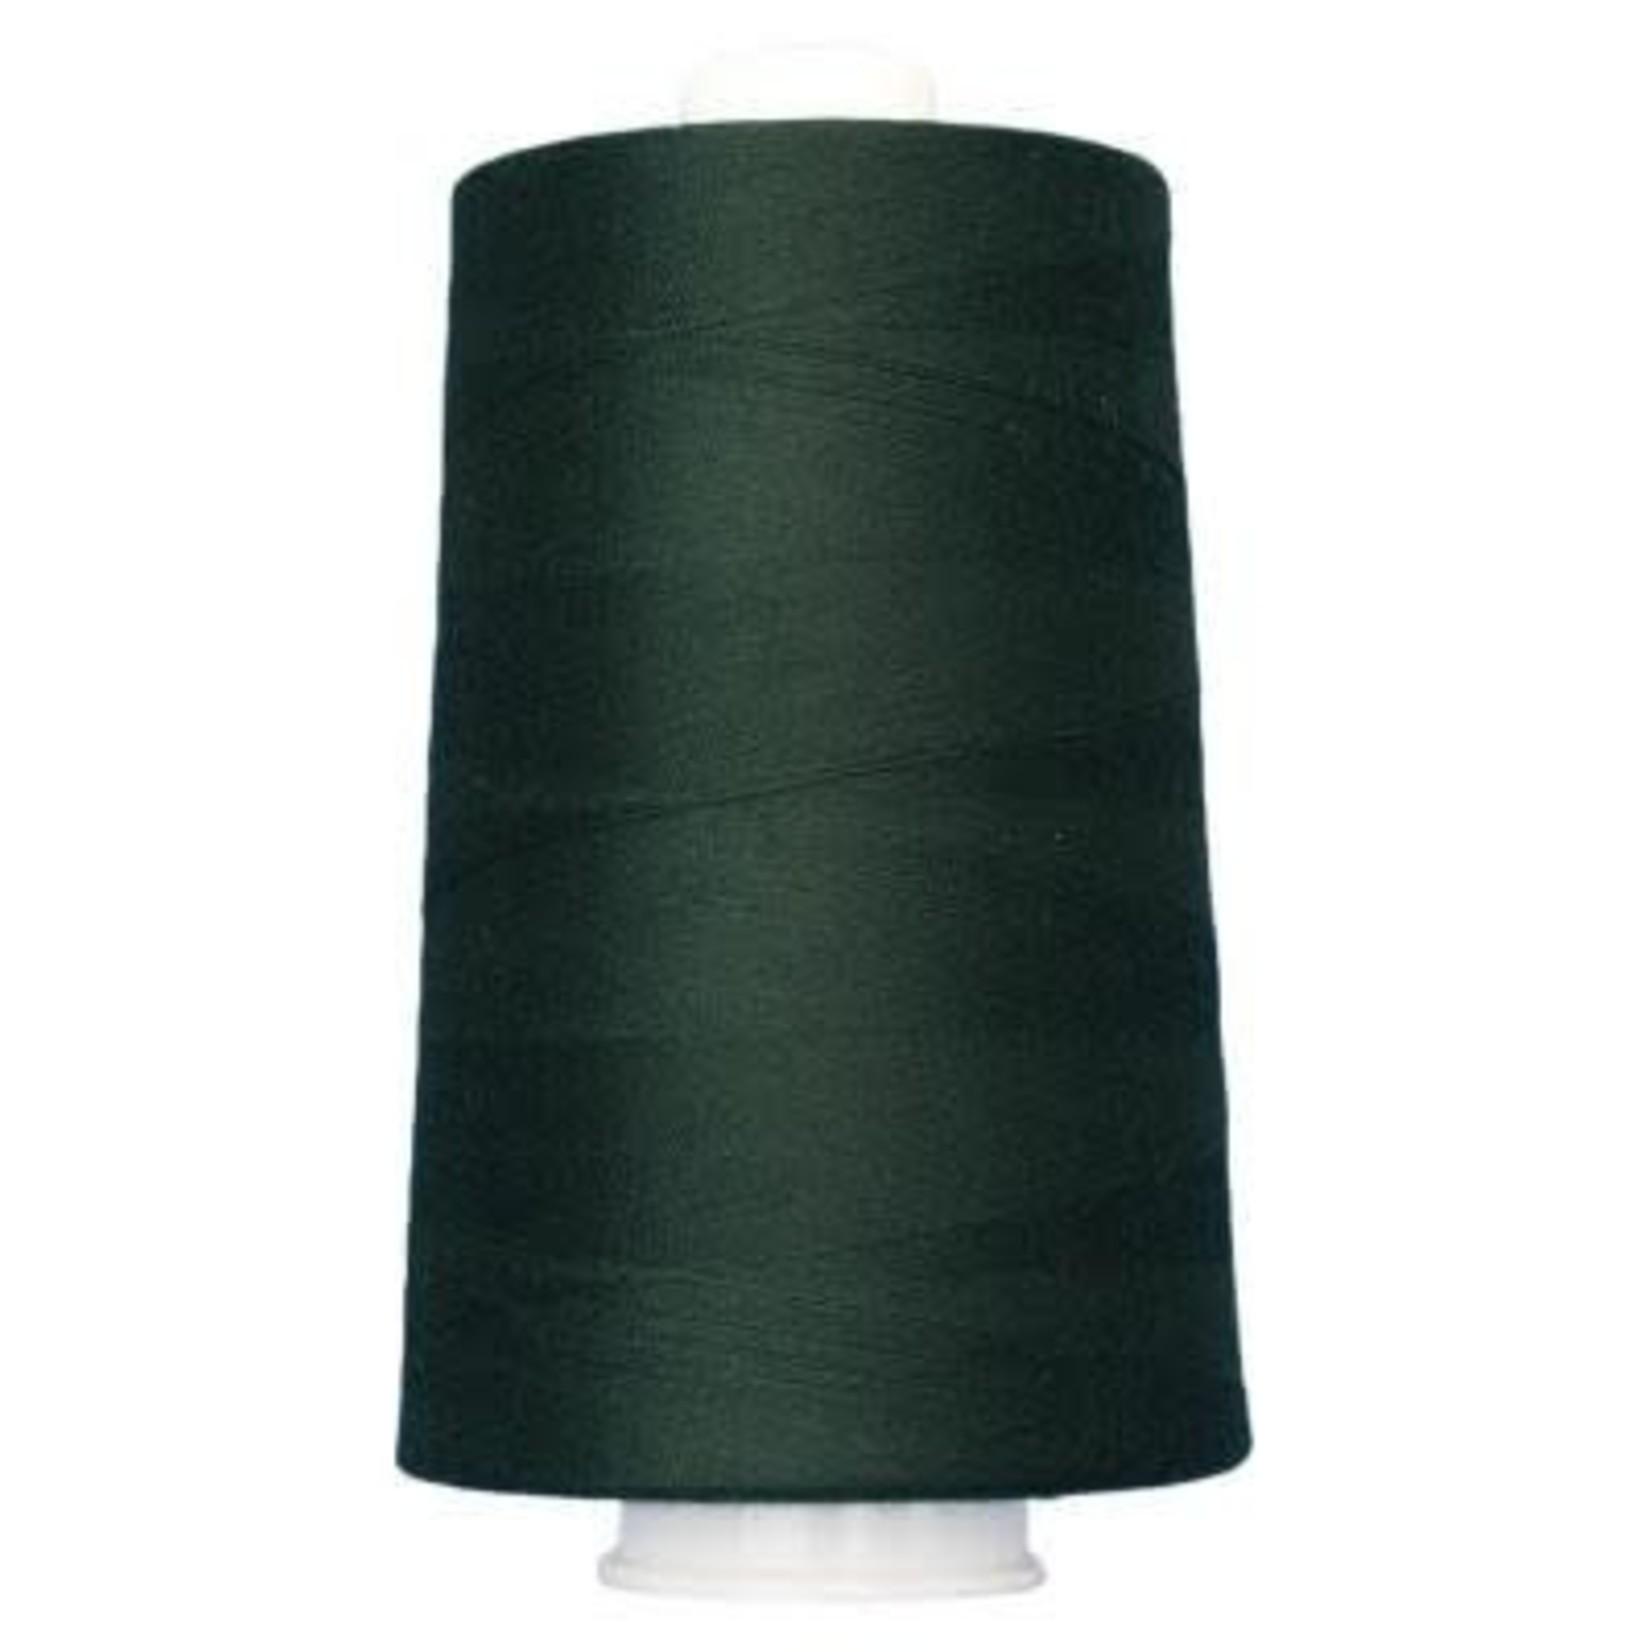 Superior Threads Omni 3080 Jungle Shadows 6000 Yards